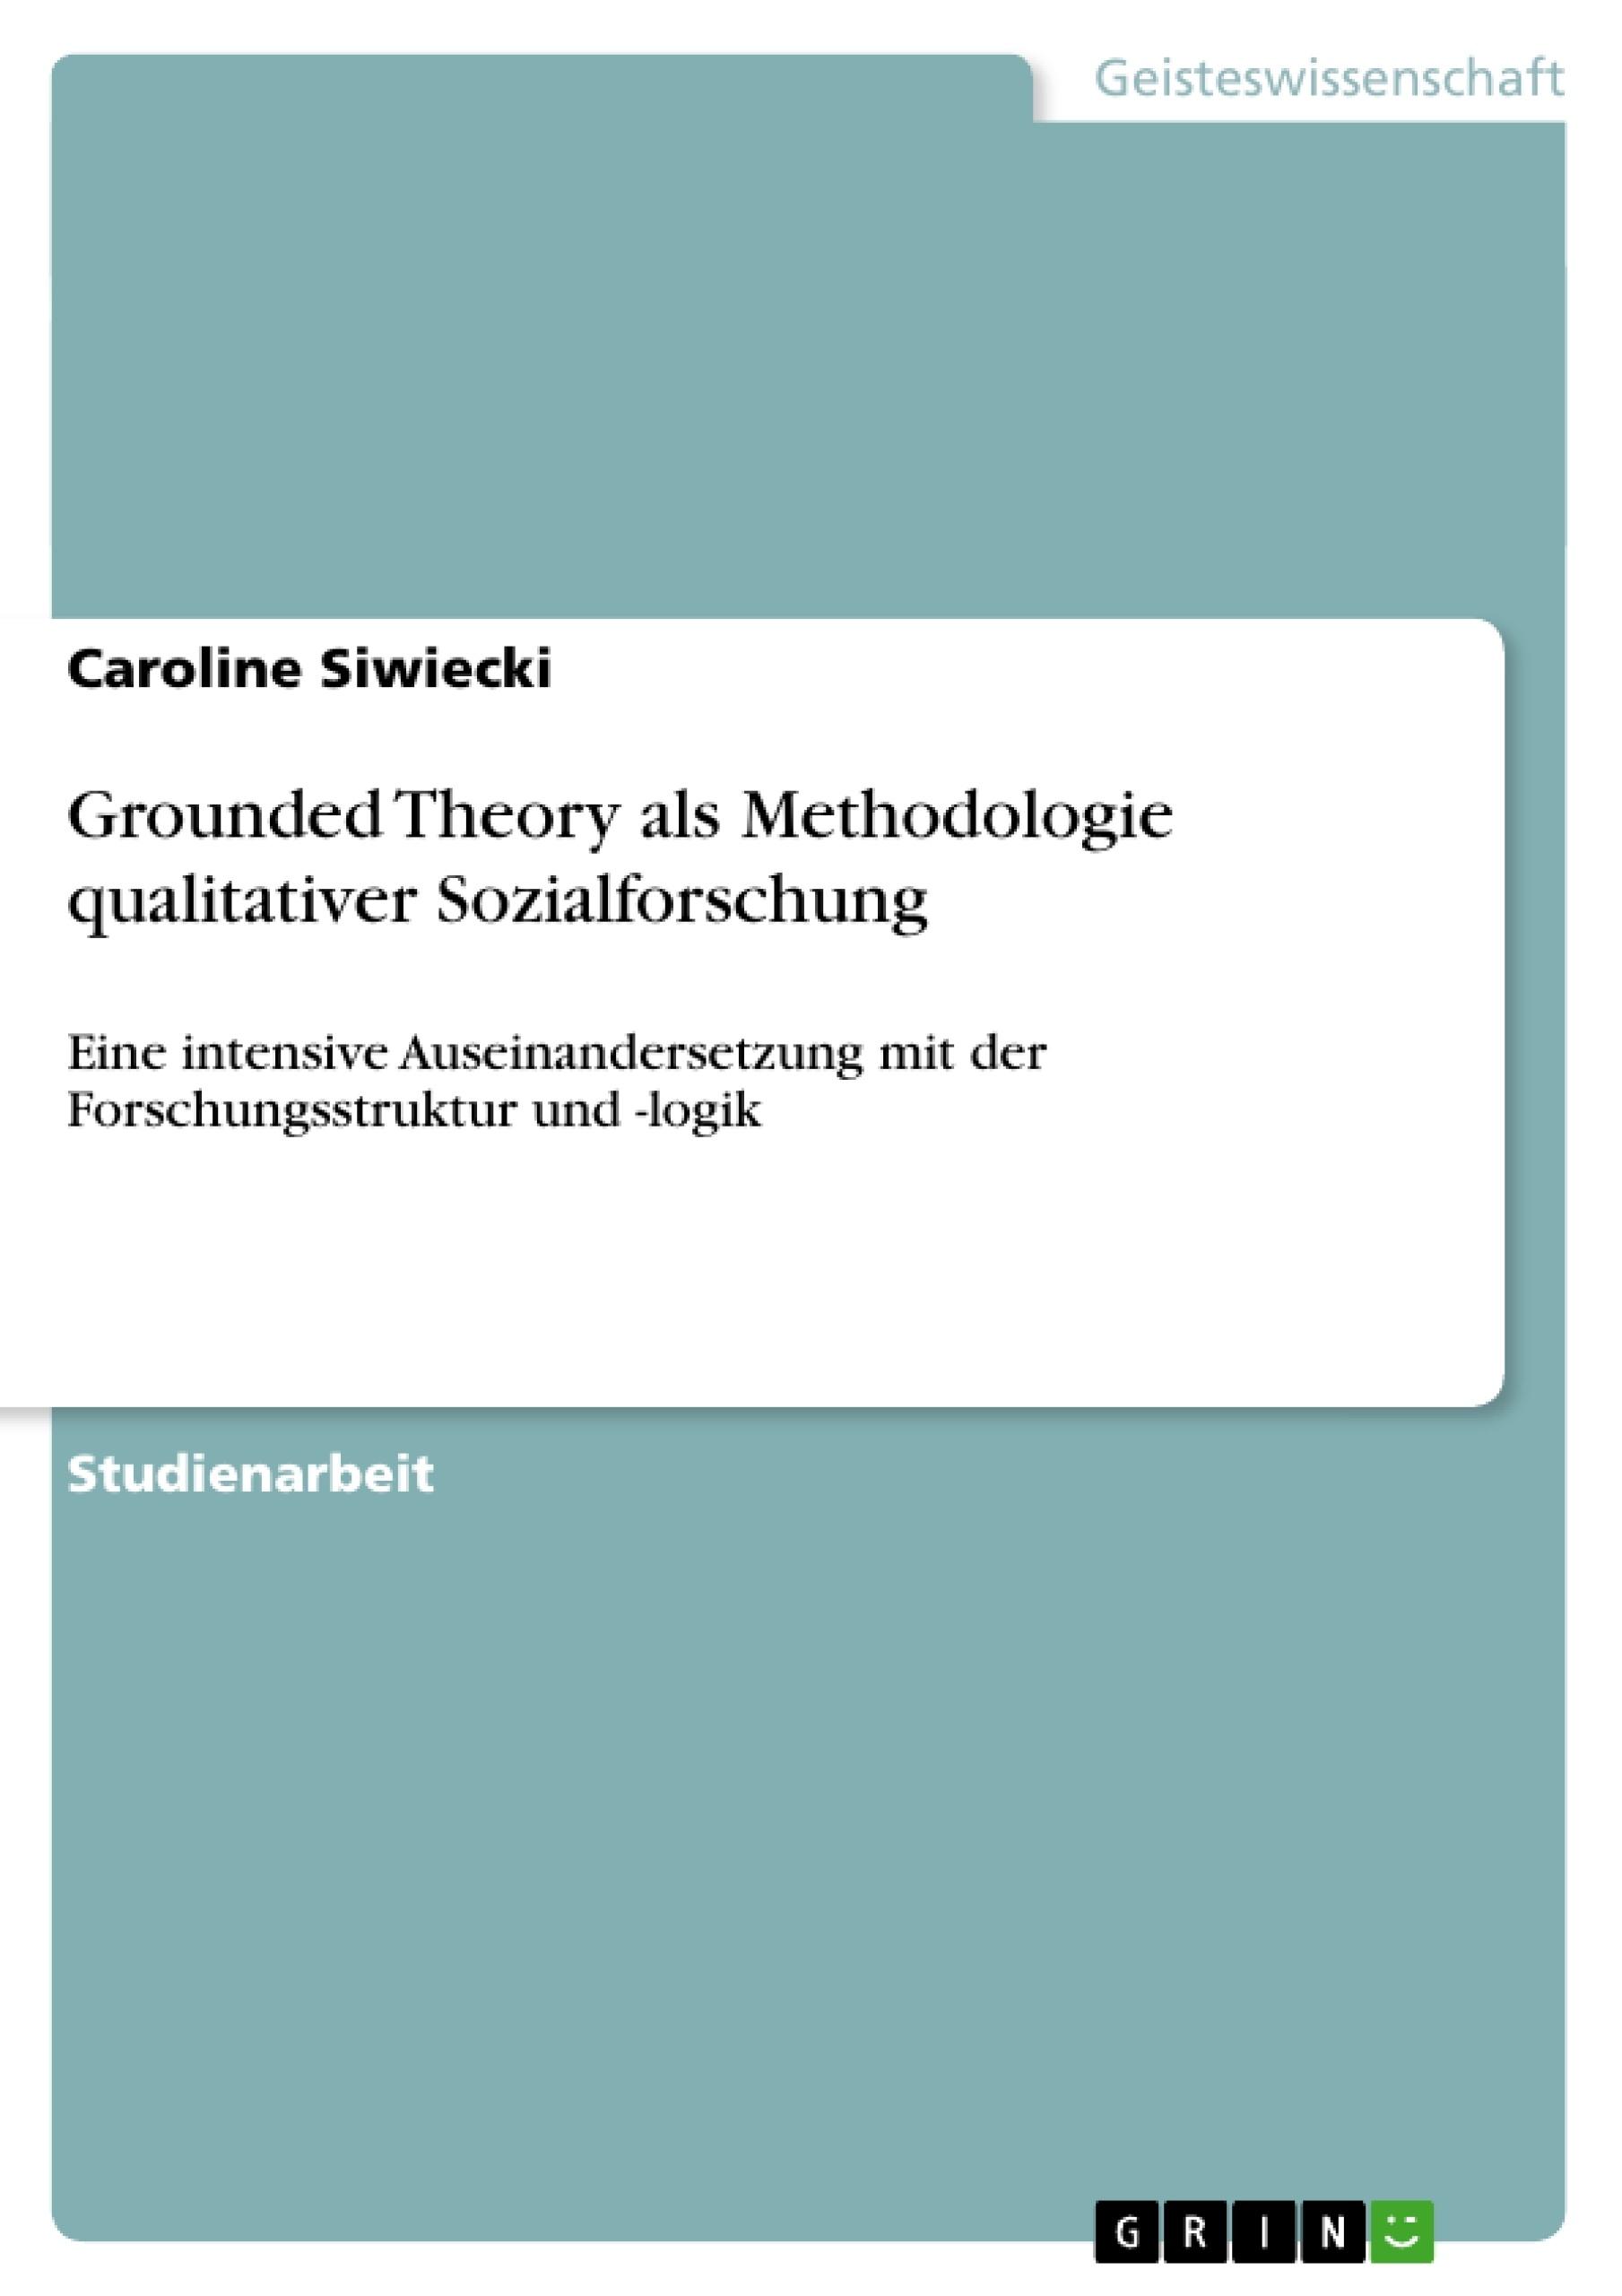 Titel: Grounded Theory als Methodologie qualitativer Sozialforschung